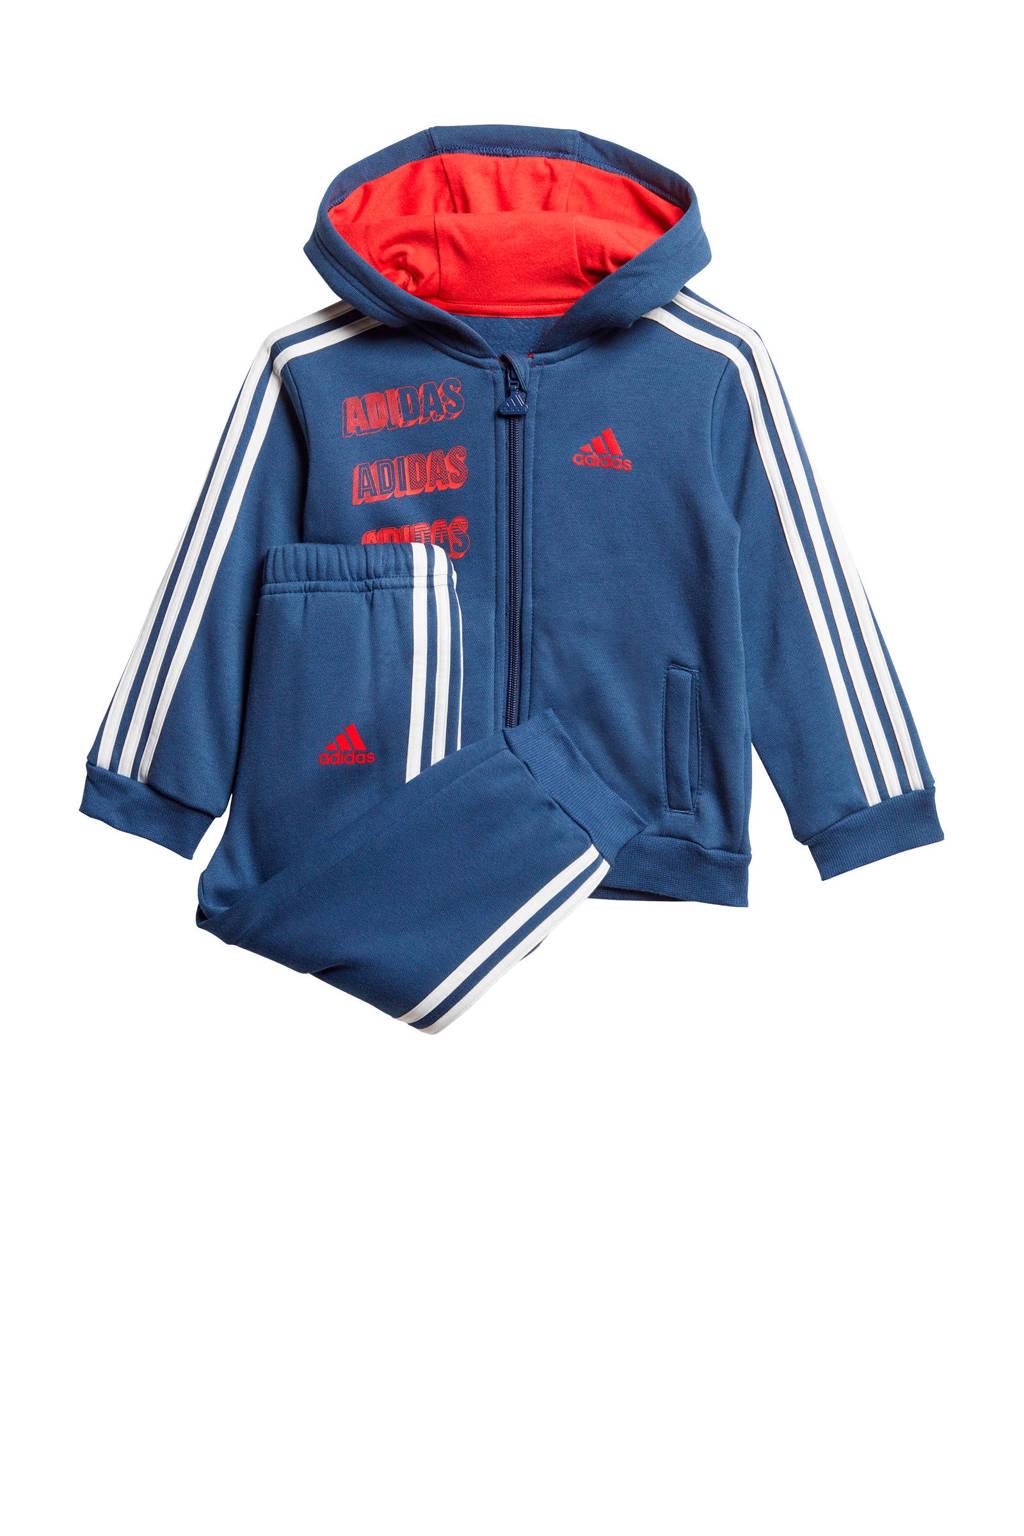 adidas Performance   joggingpak blauw/wit/rood, Blauw/wit/rood